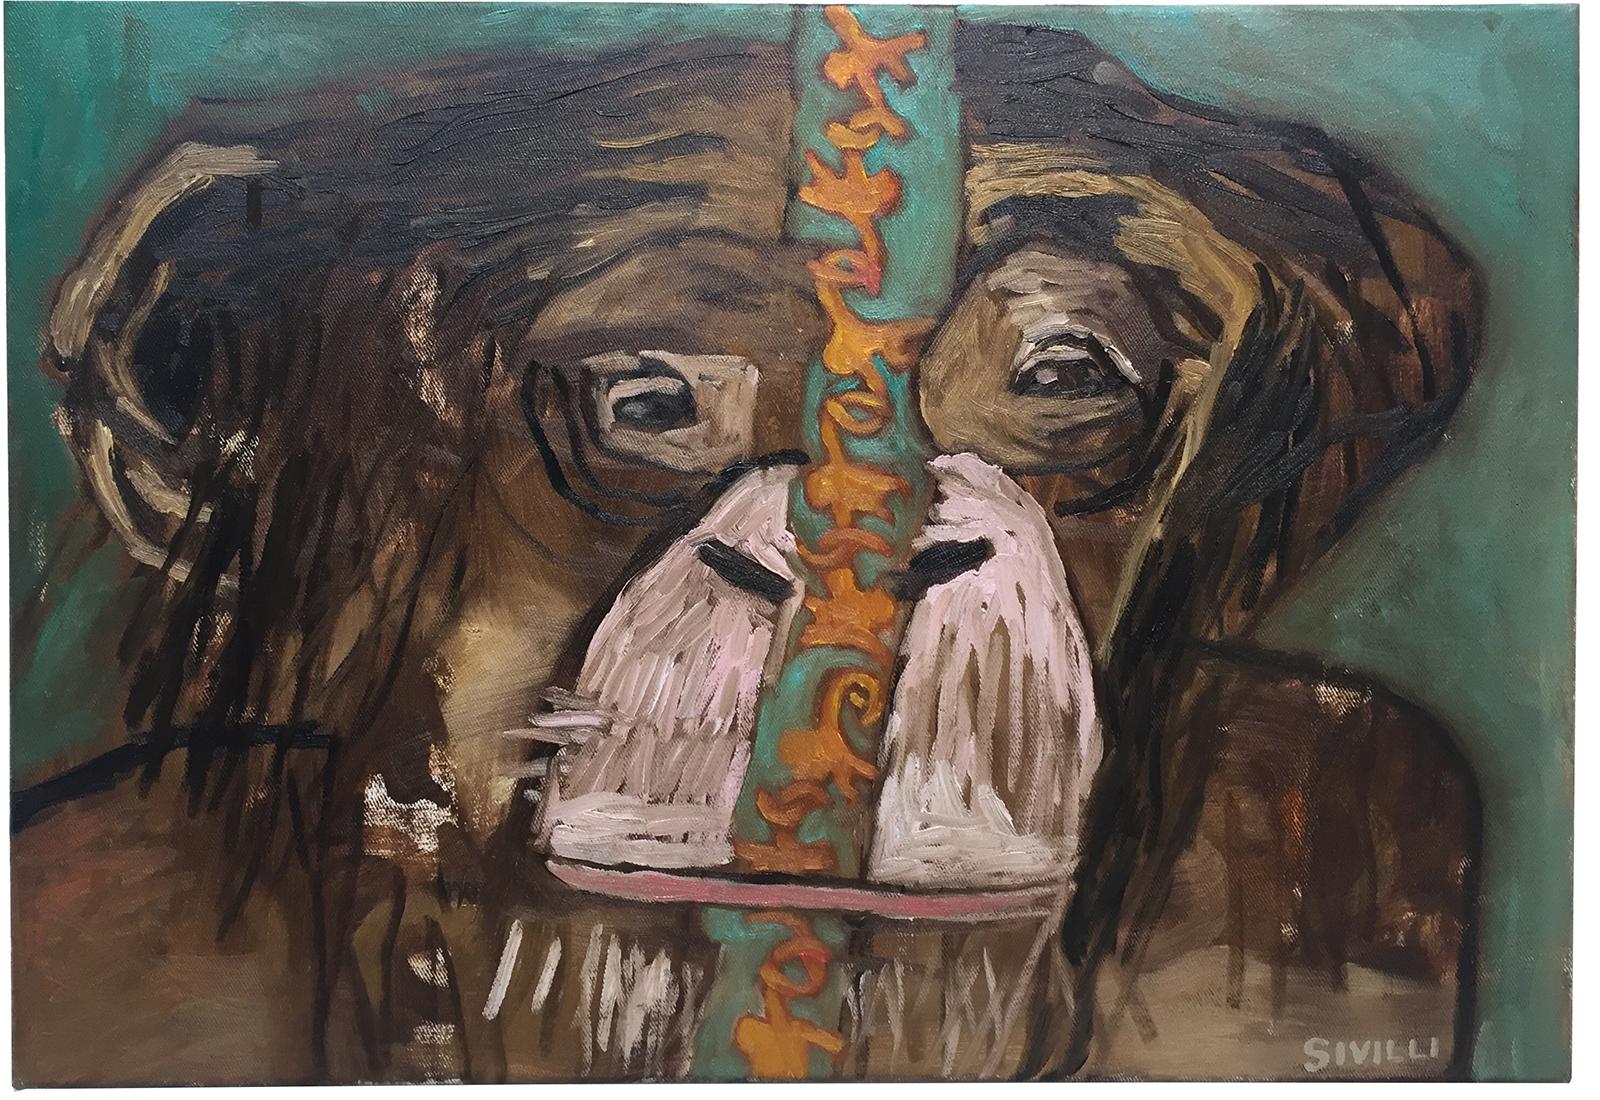 Val Sivilli • Chimp 4 • Oil on Canvas • 28 x 16 x 1 Inches • 2018